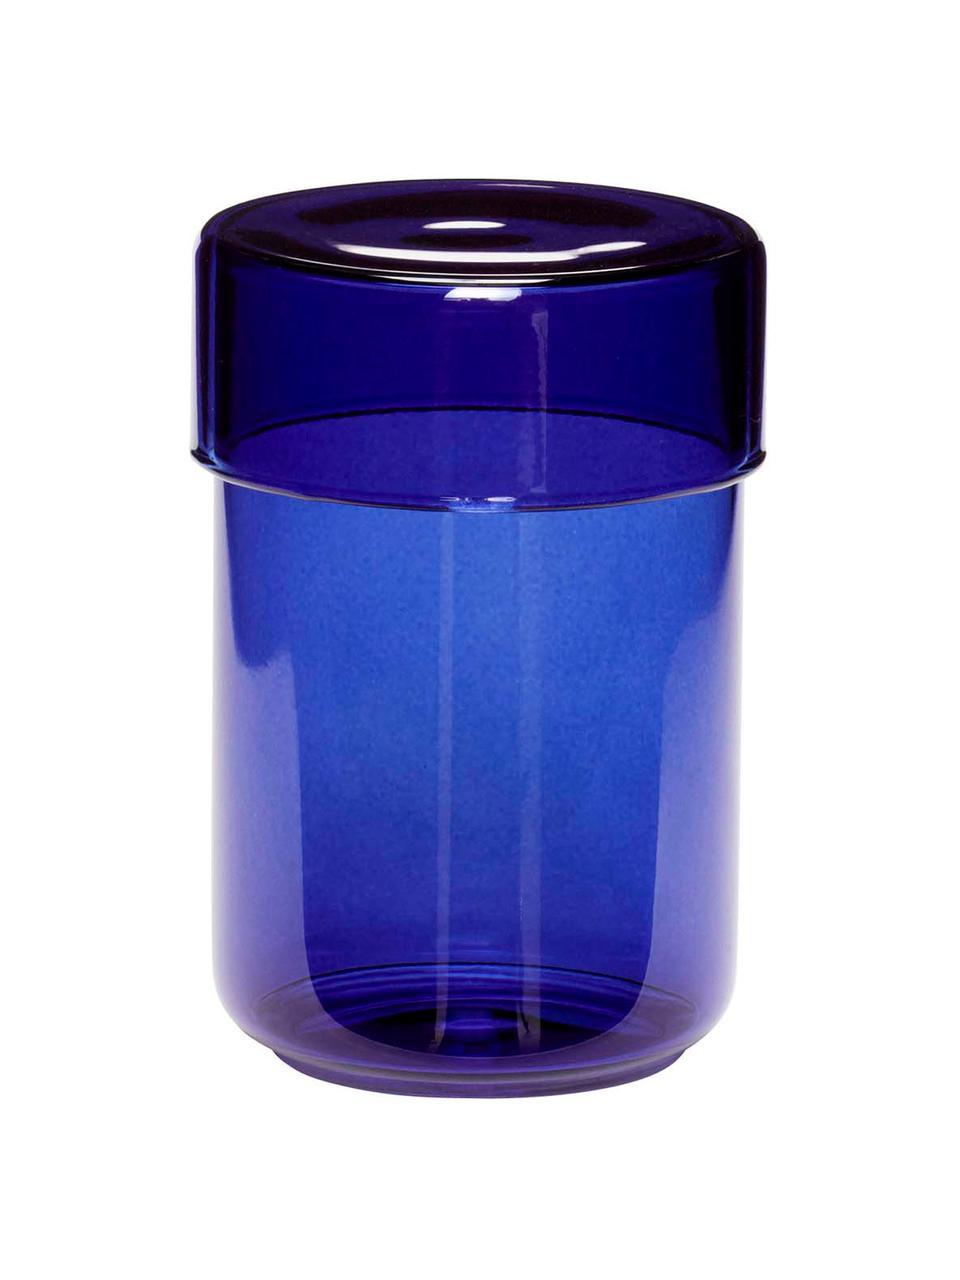 Boîte en verre bleu Transisto, 2élém., Bleu